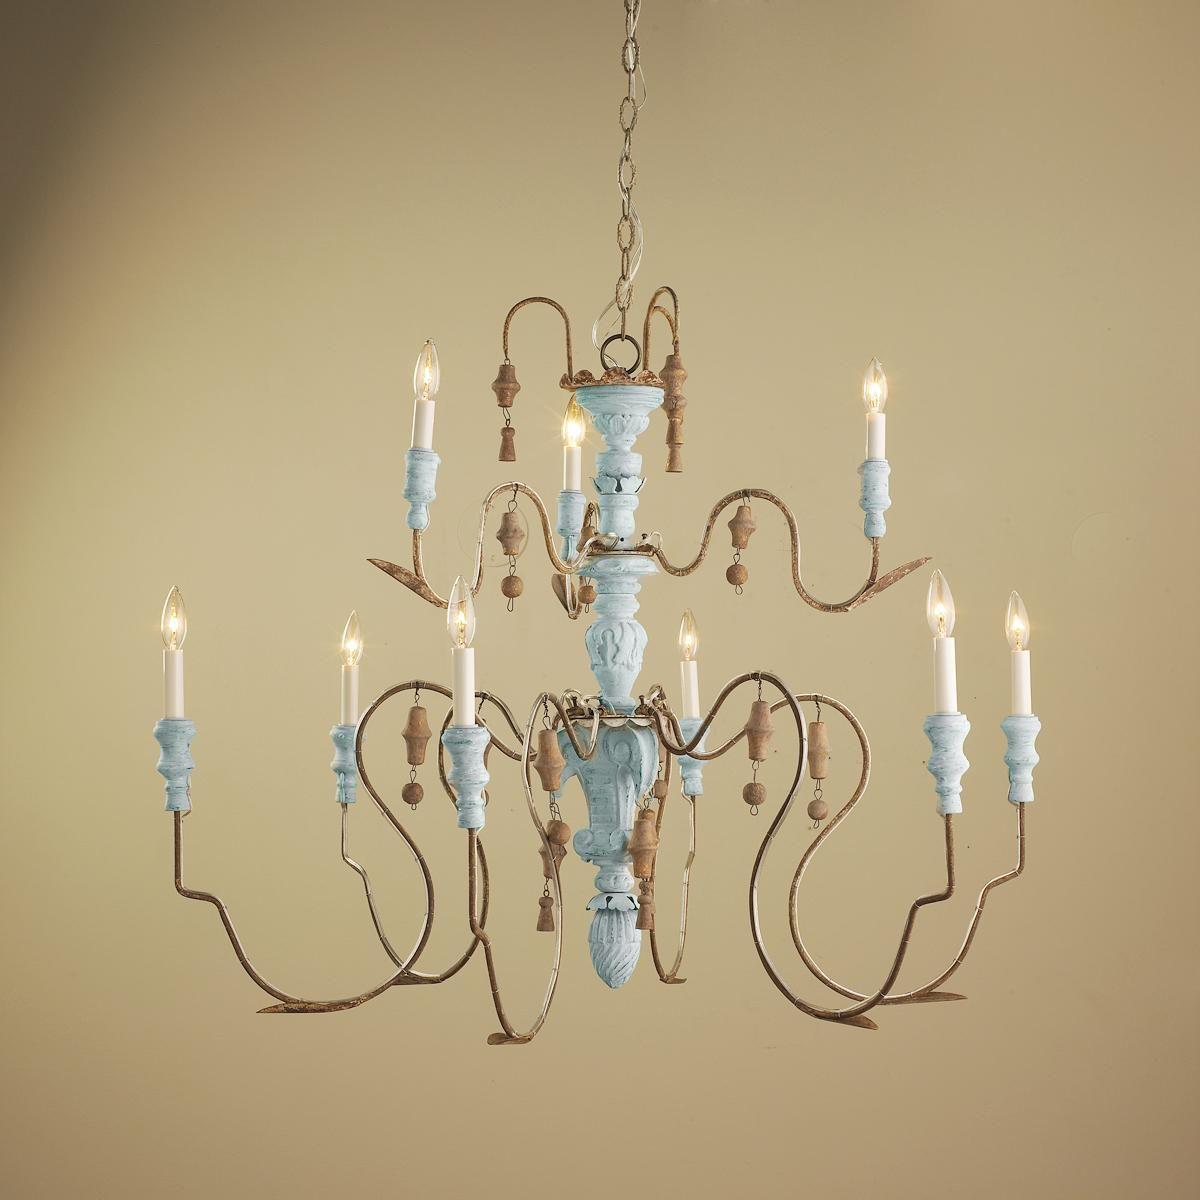 Aqua Grand Manoir Carved Wood Chandelier 9 Light Wood Chandelier Vintage Crystal Chandelier Favorite Lighting